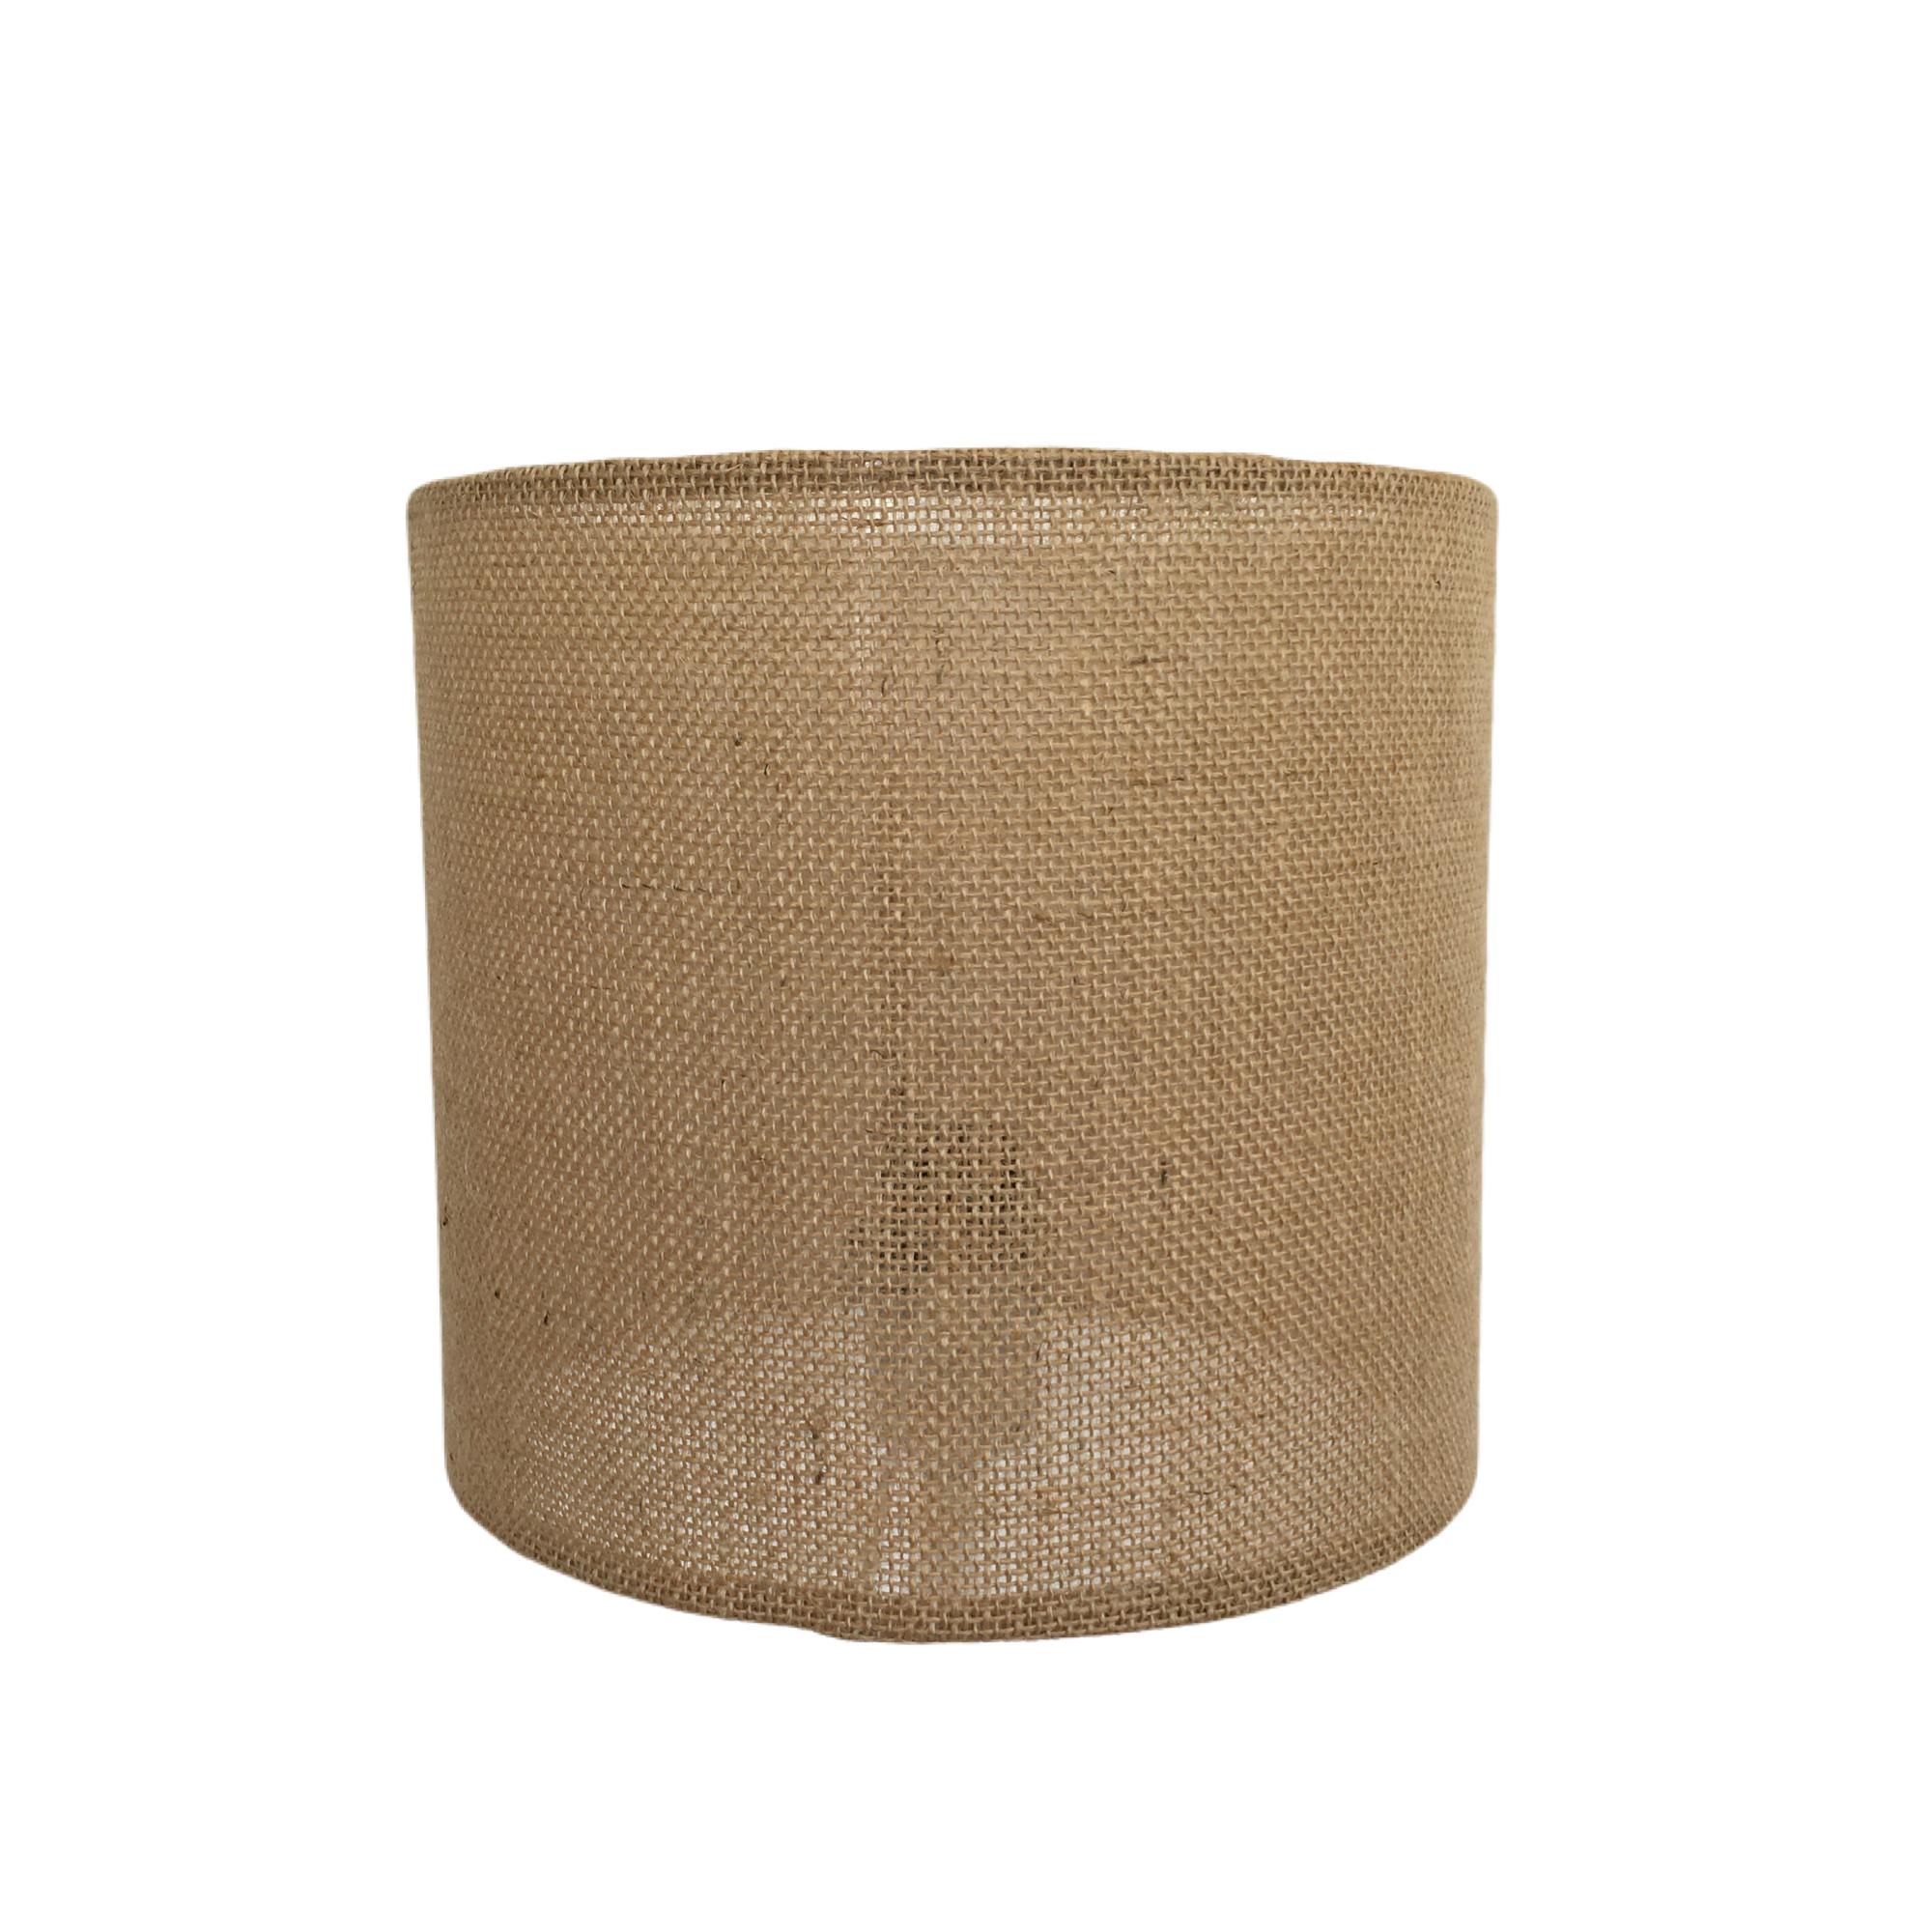 Suspension toile de jute diamètre 25 cm